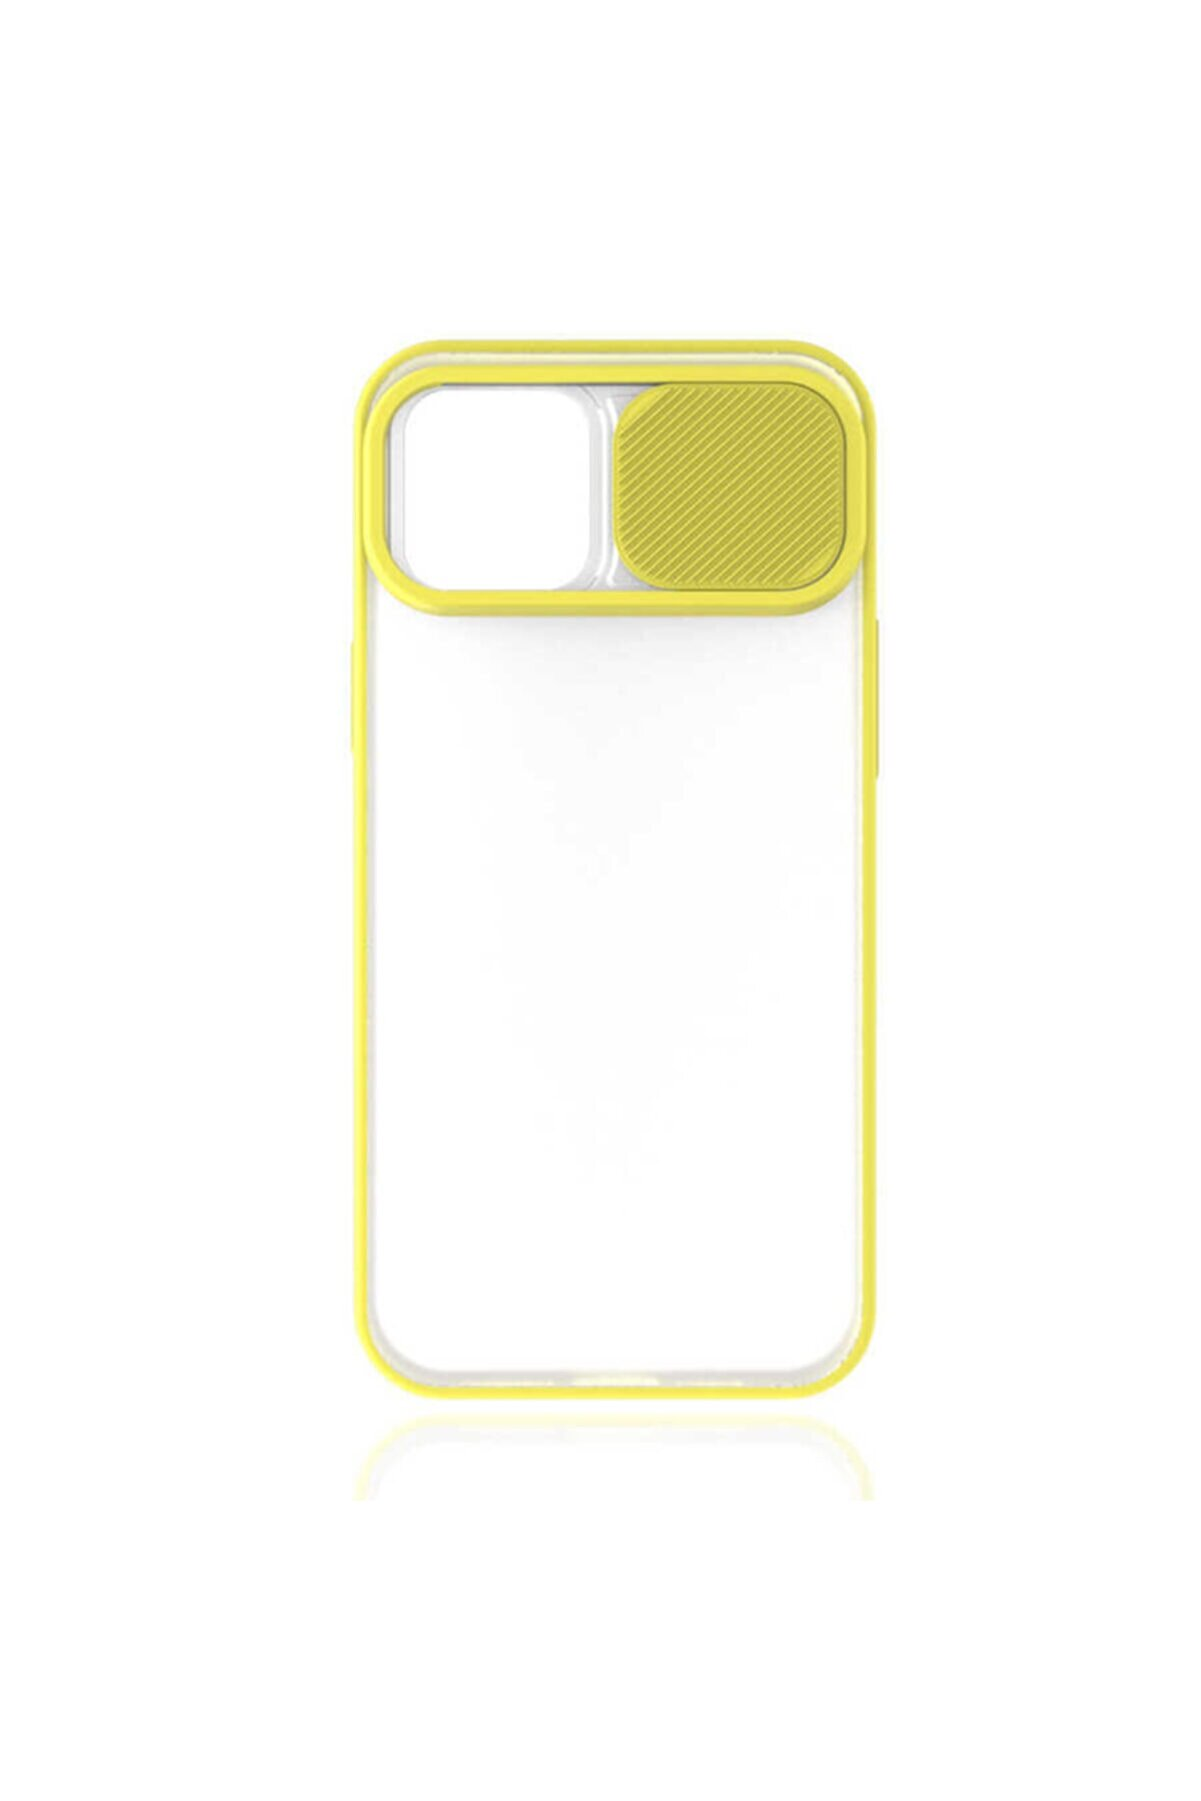 Zore Apple Iphone 12 Pro Max Uyumlu  Lensi Kapak